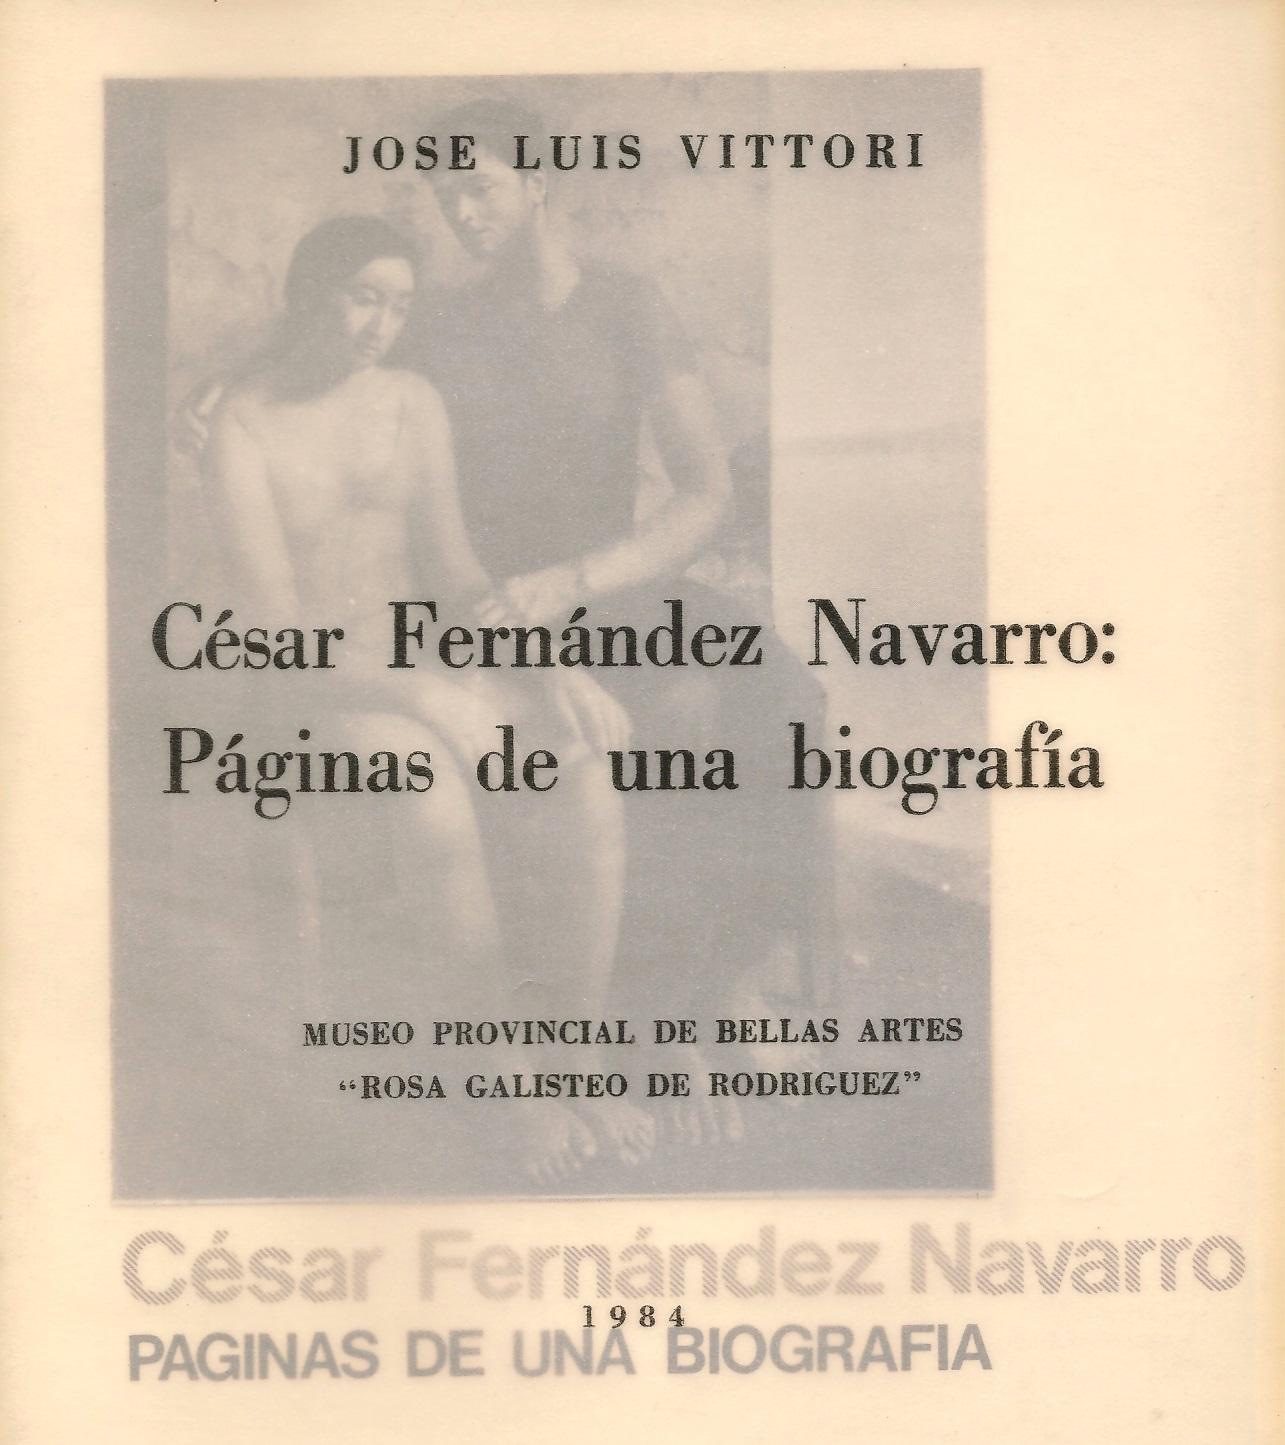 VITTORI César Fernandez Navarro